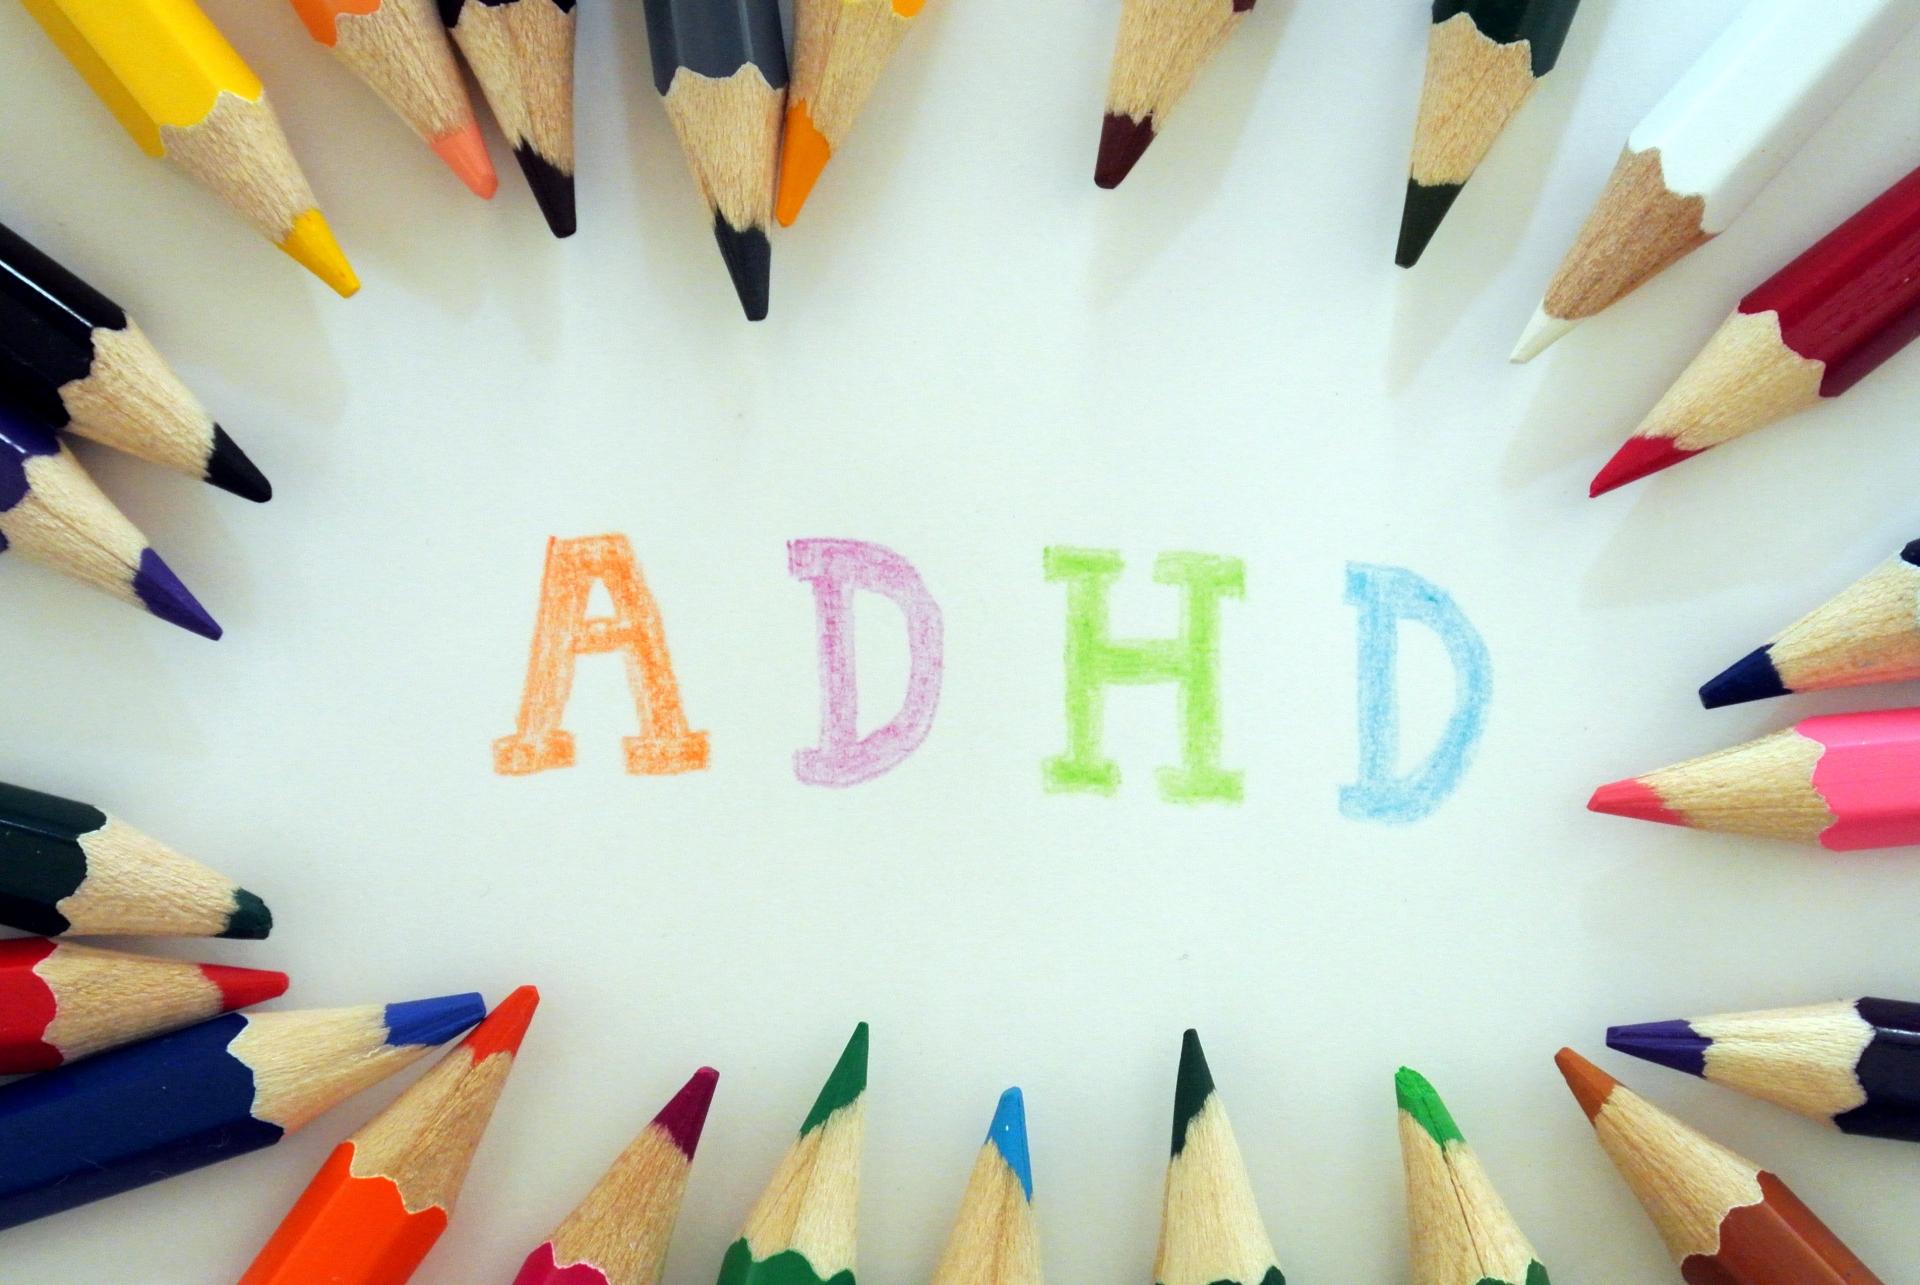 ADHDと診断された方に向いている仕事と傾向は?